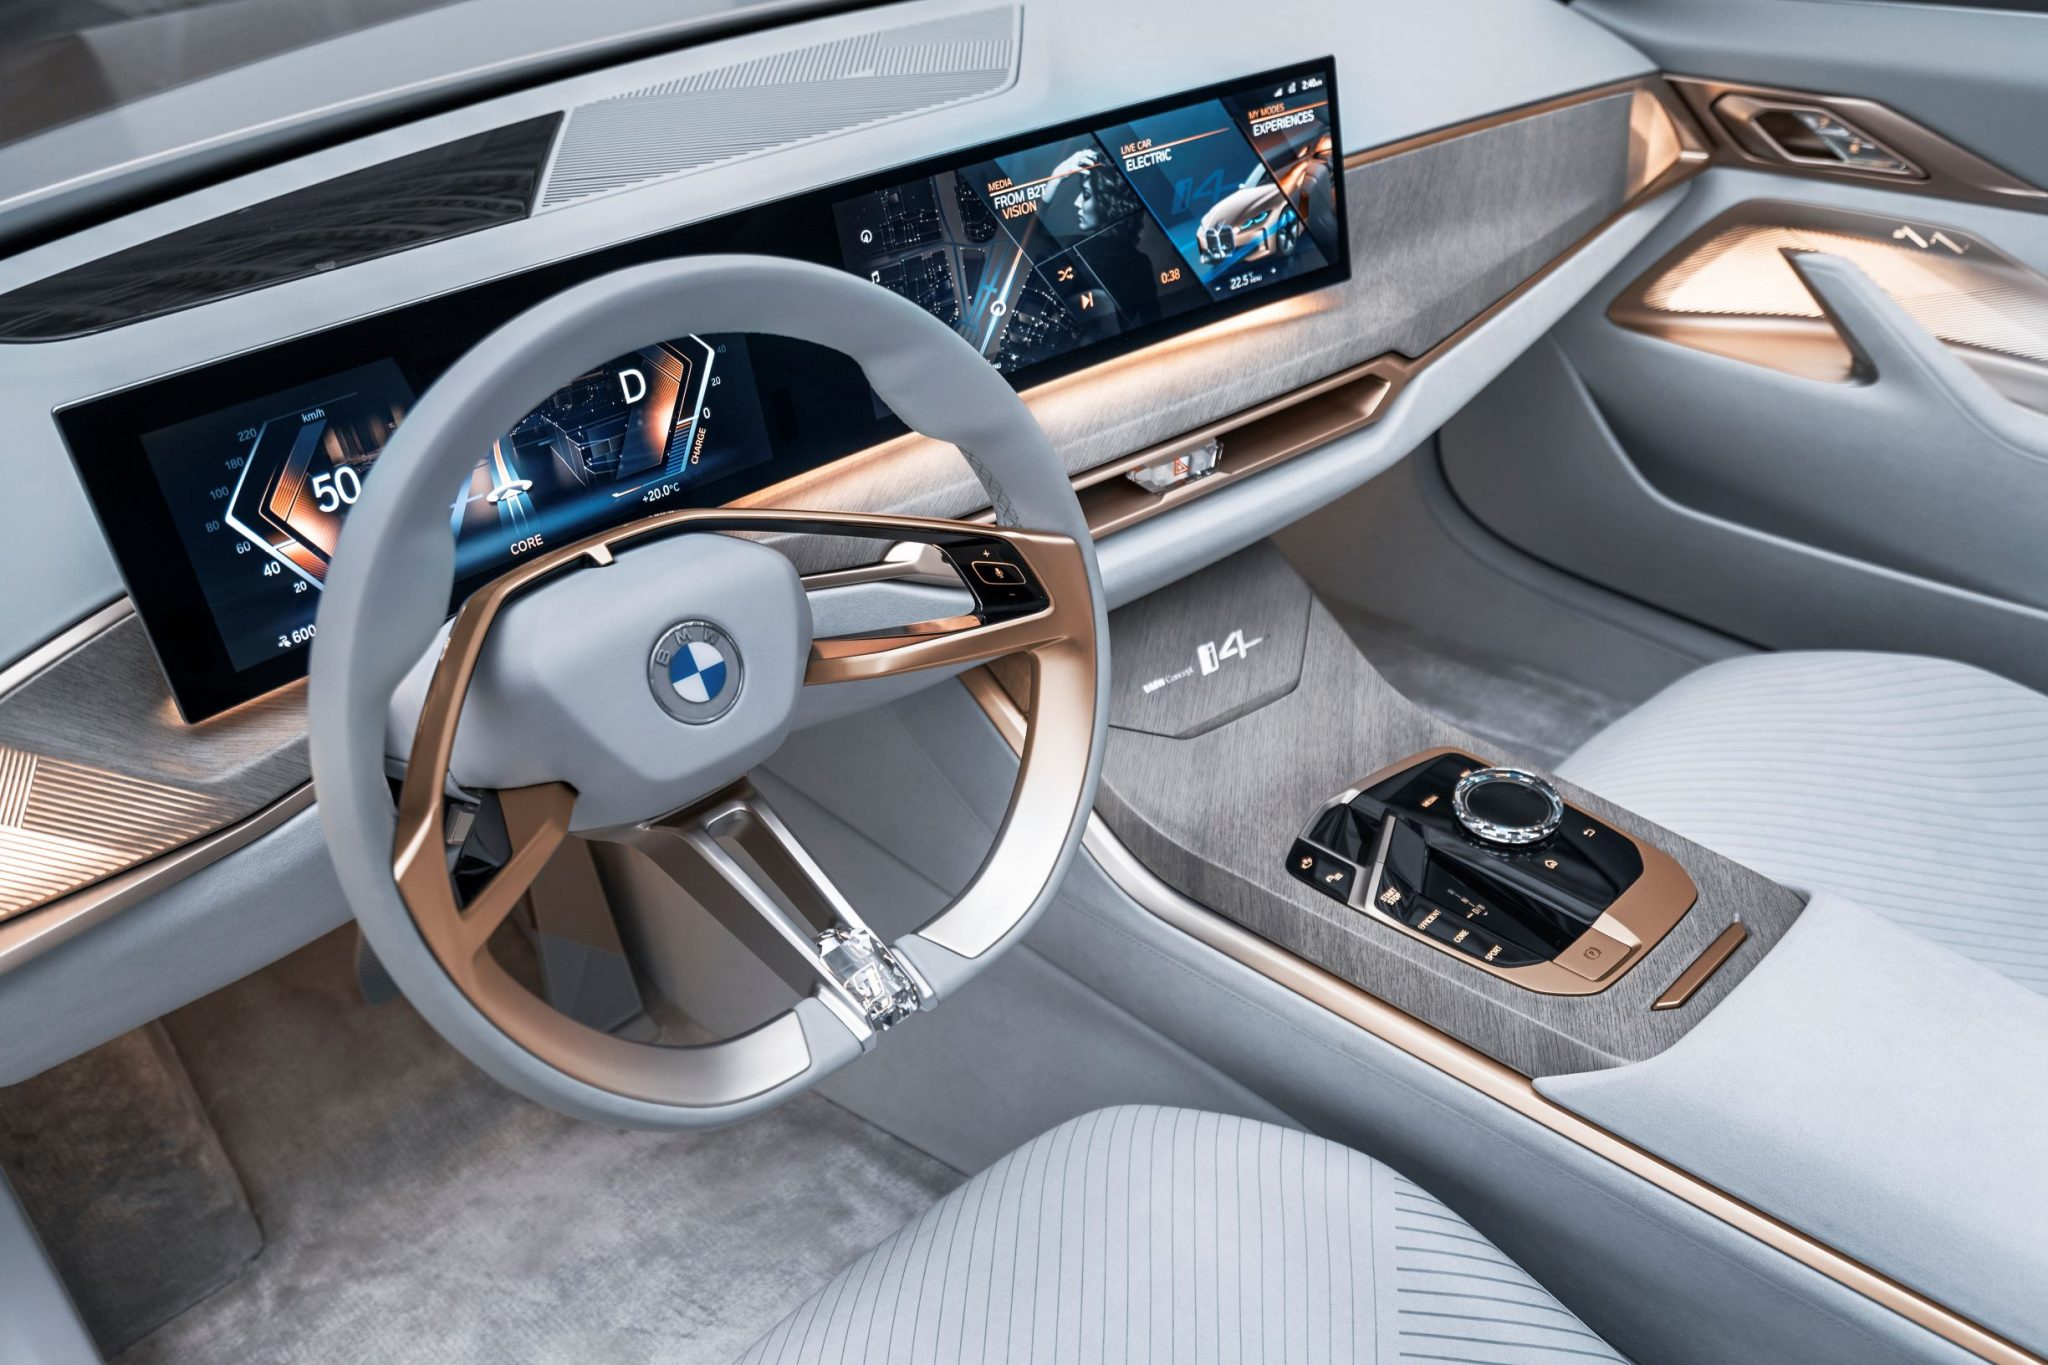 BMW Concept i4 interni